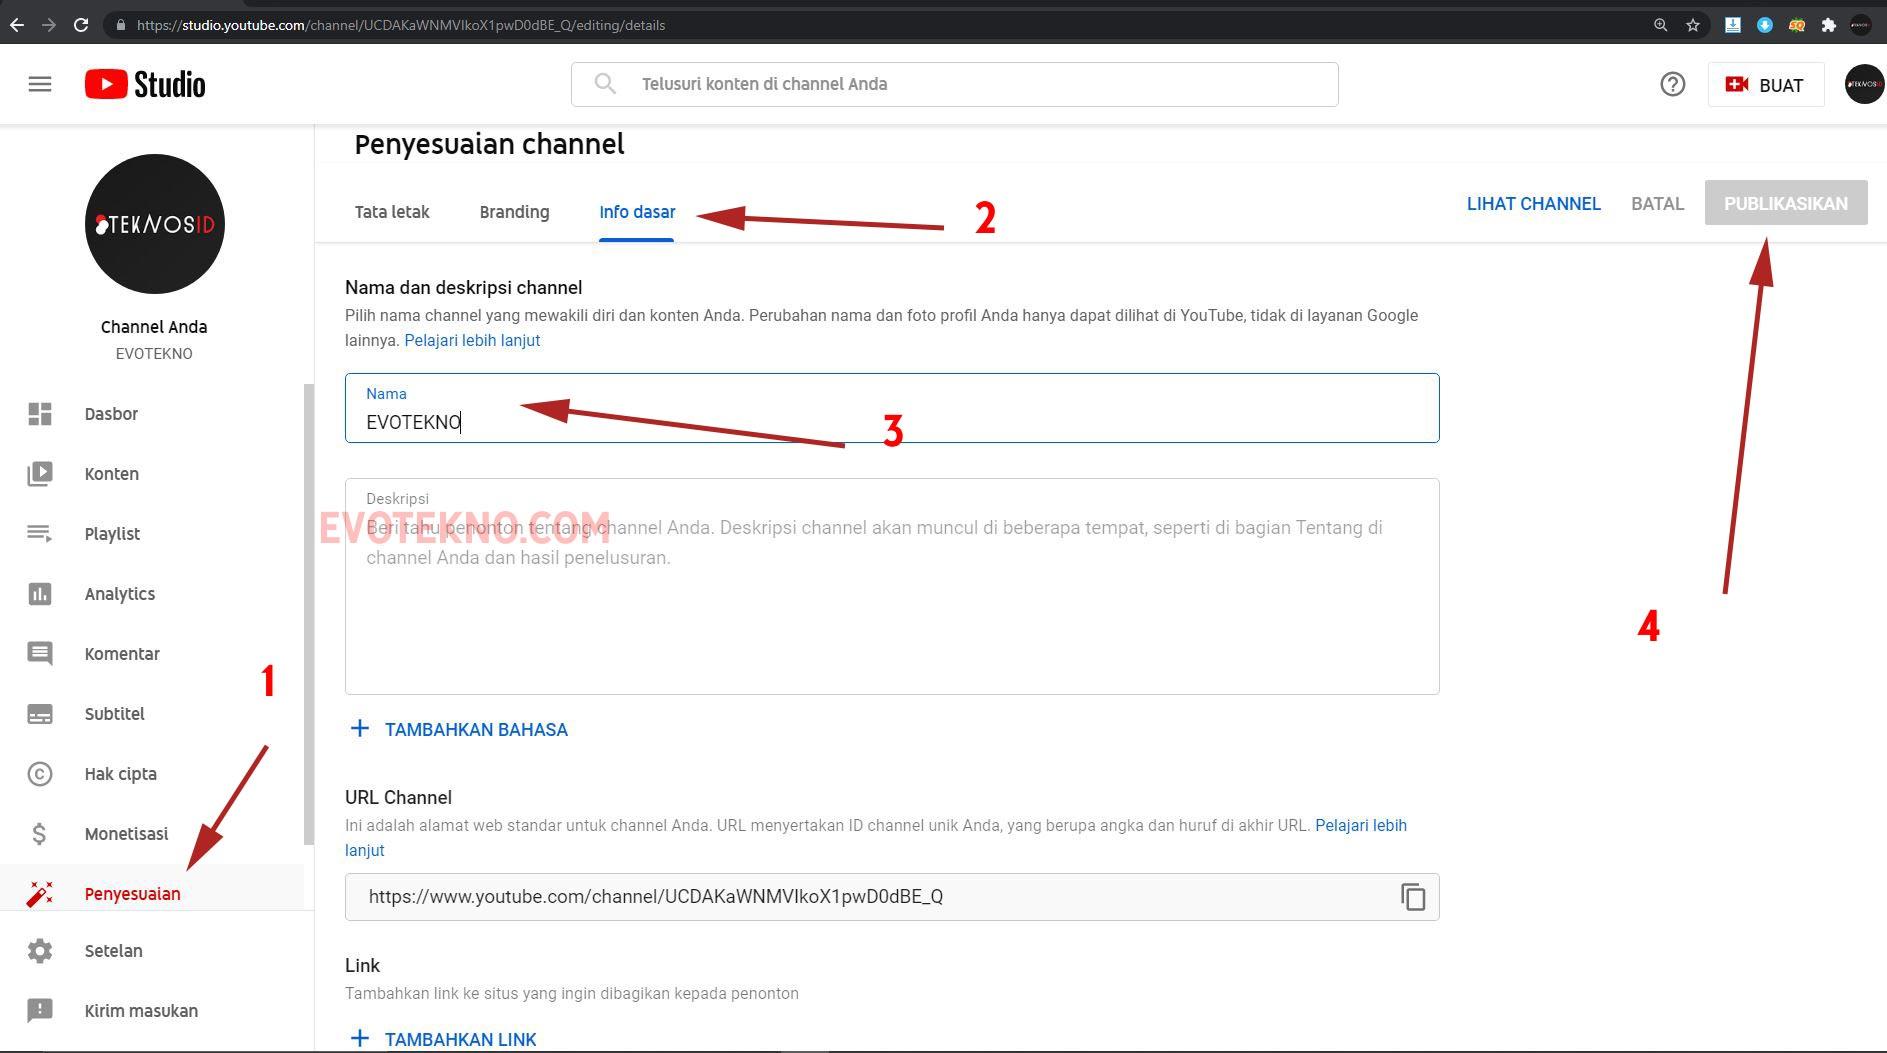 YouTube Studio - Penyesuaian - Info Dasar - Ganti Nama Channel